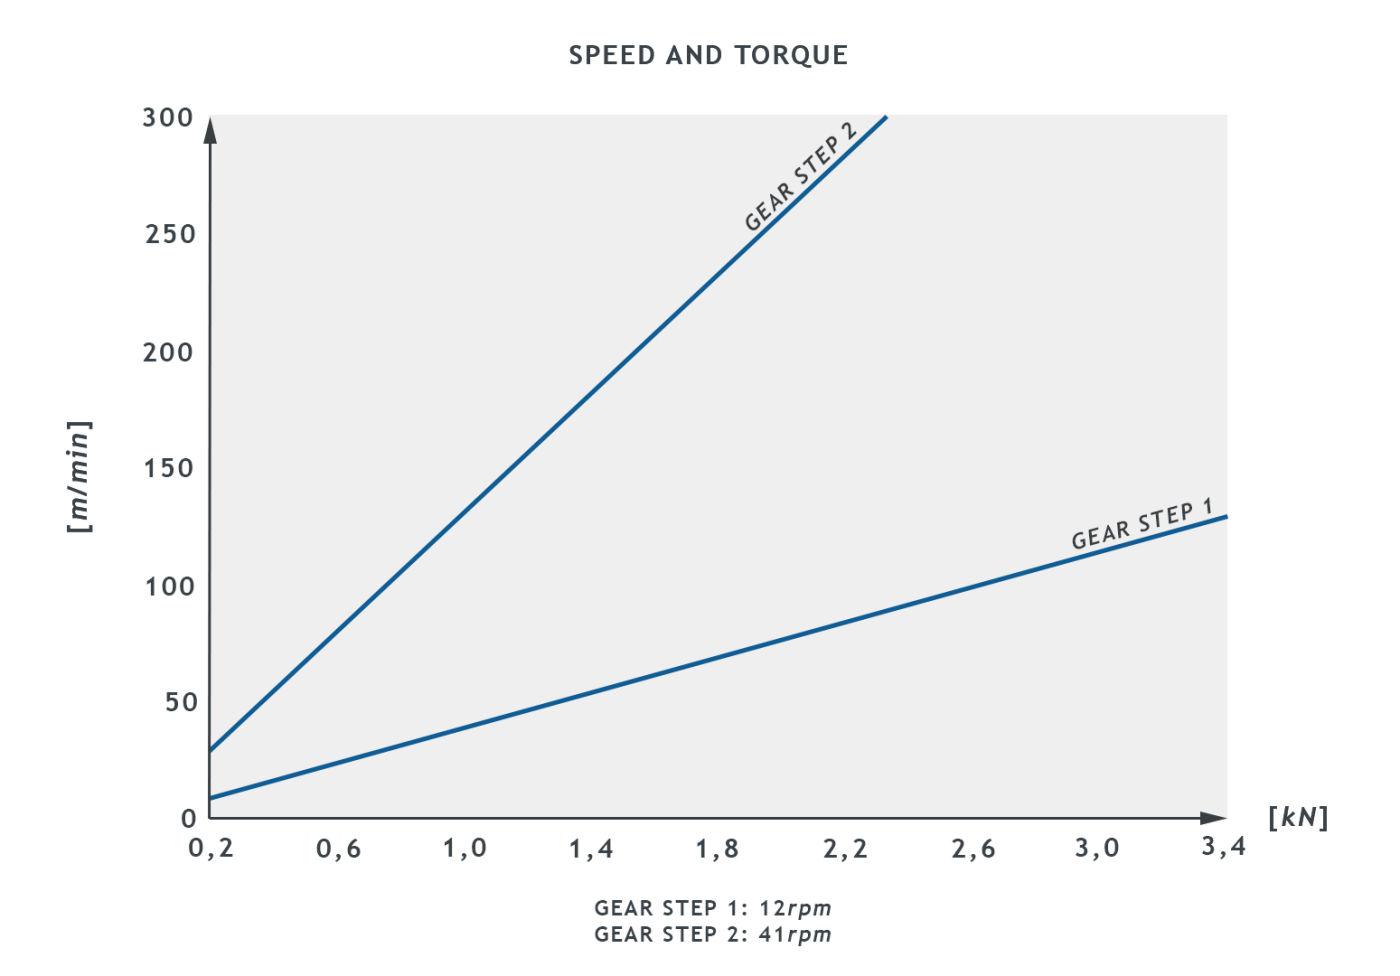 AVR15_SB0405004_SpeedTorque_graph1.jpg